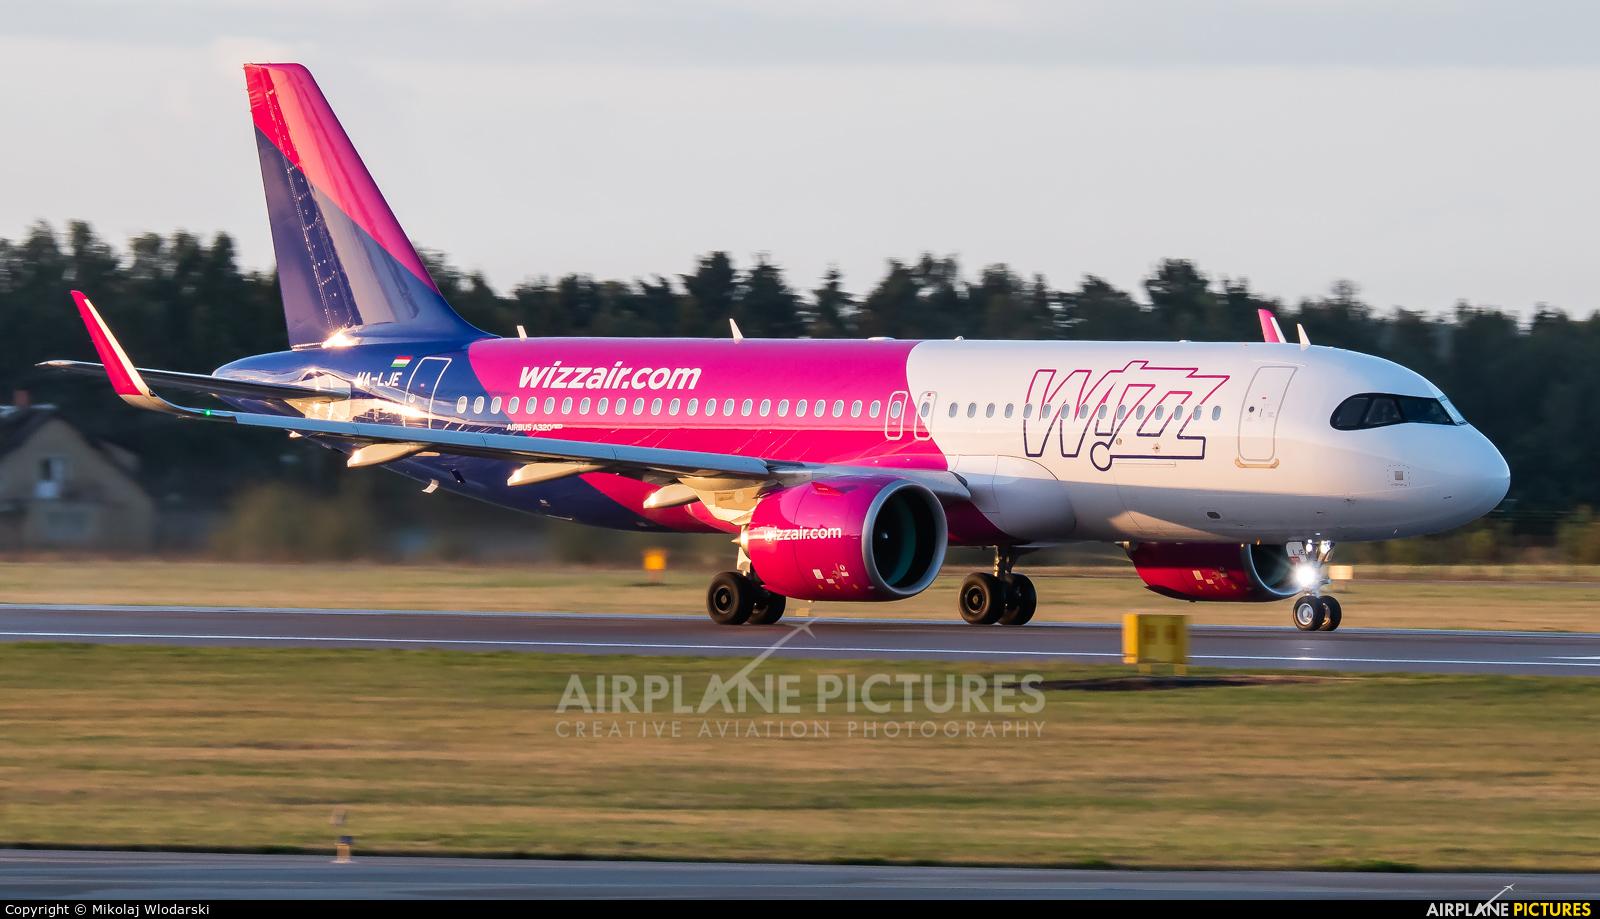 Wizz Air HA-LJE aircraft at Gdańsk - Lech Wałęsa